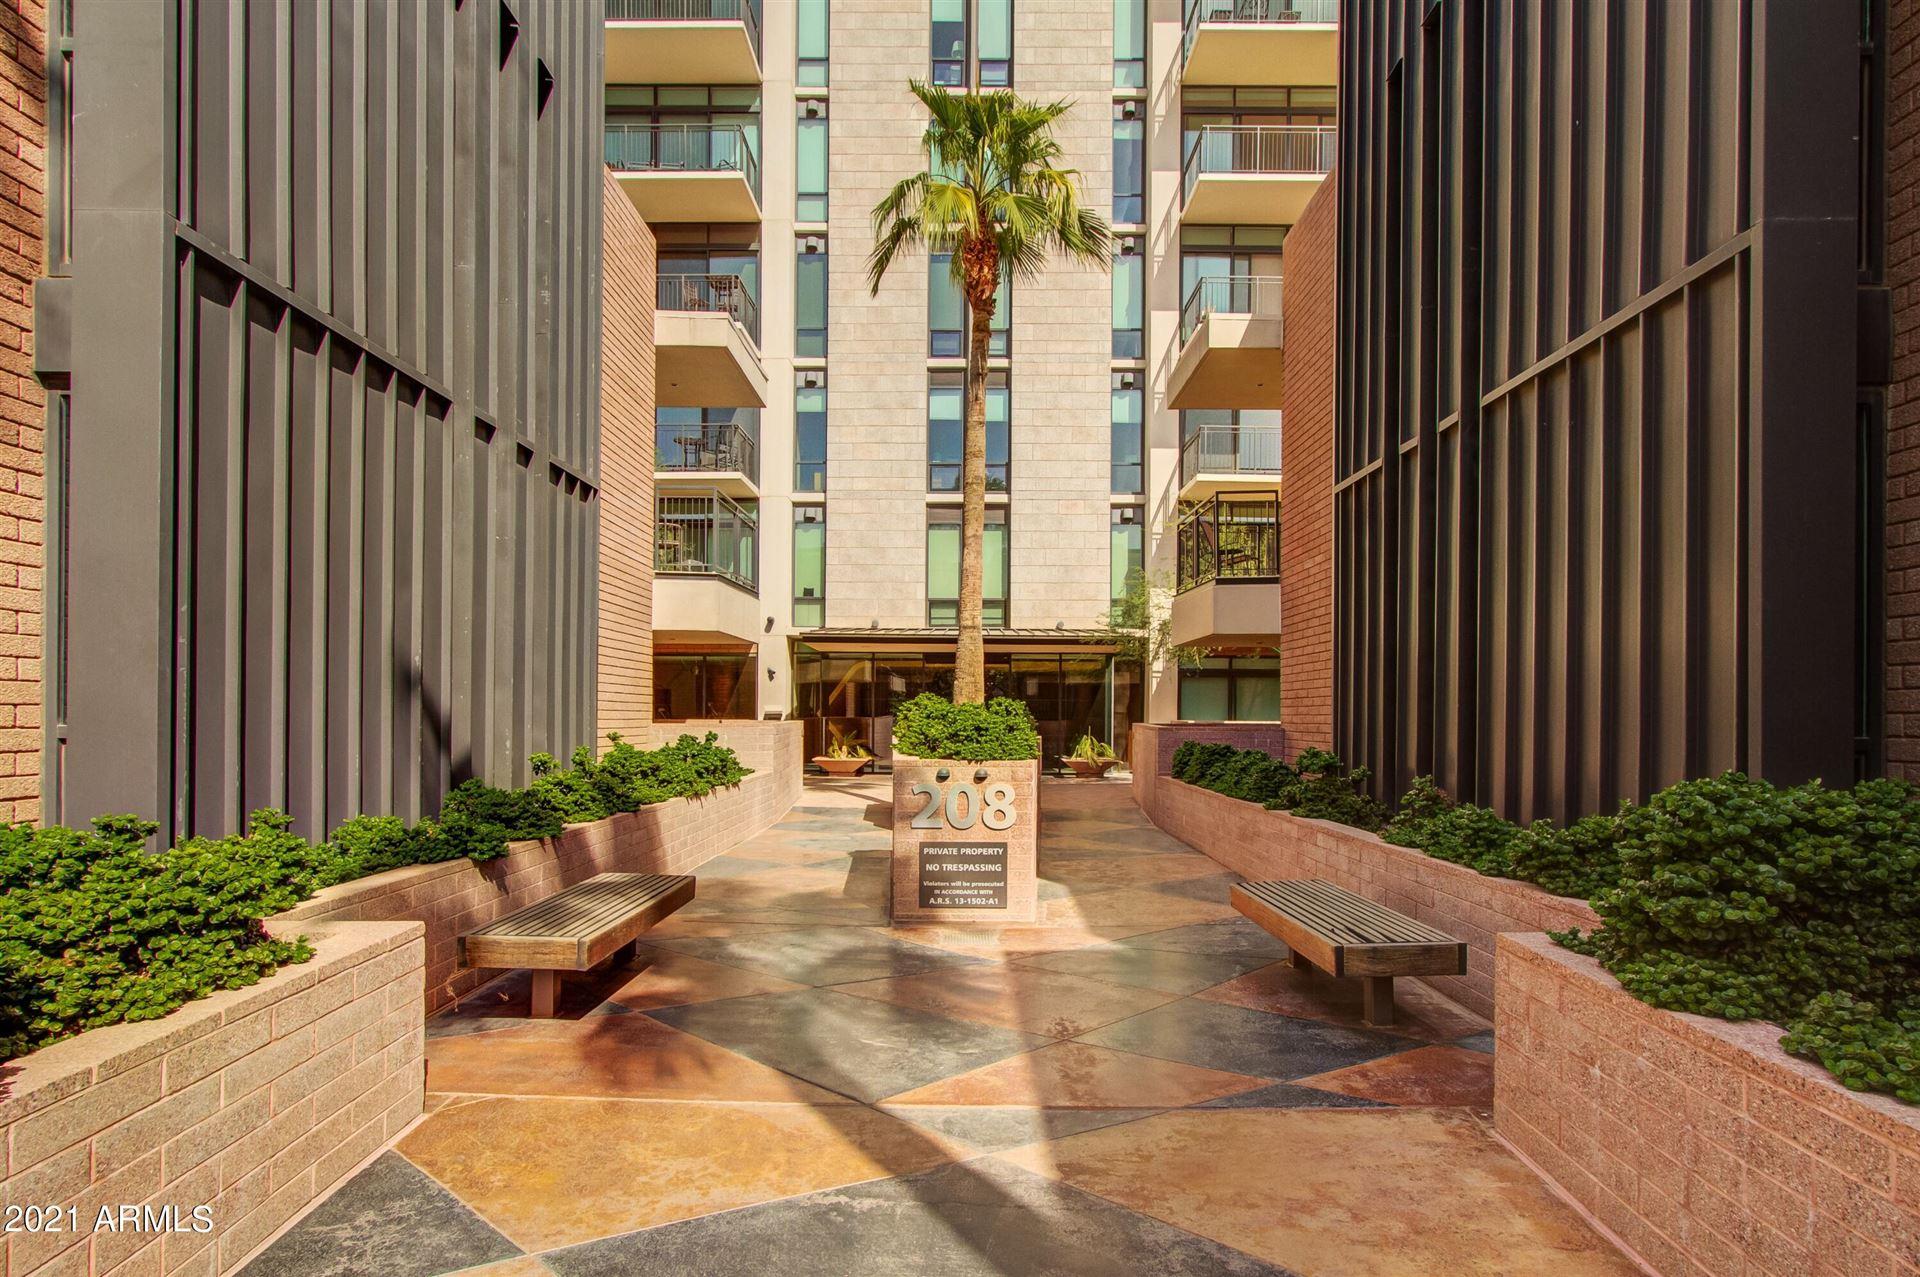 Photo of 208 W PORTLAND Street #257, Phoenix, AZ 85003 (MLS # 6307771)